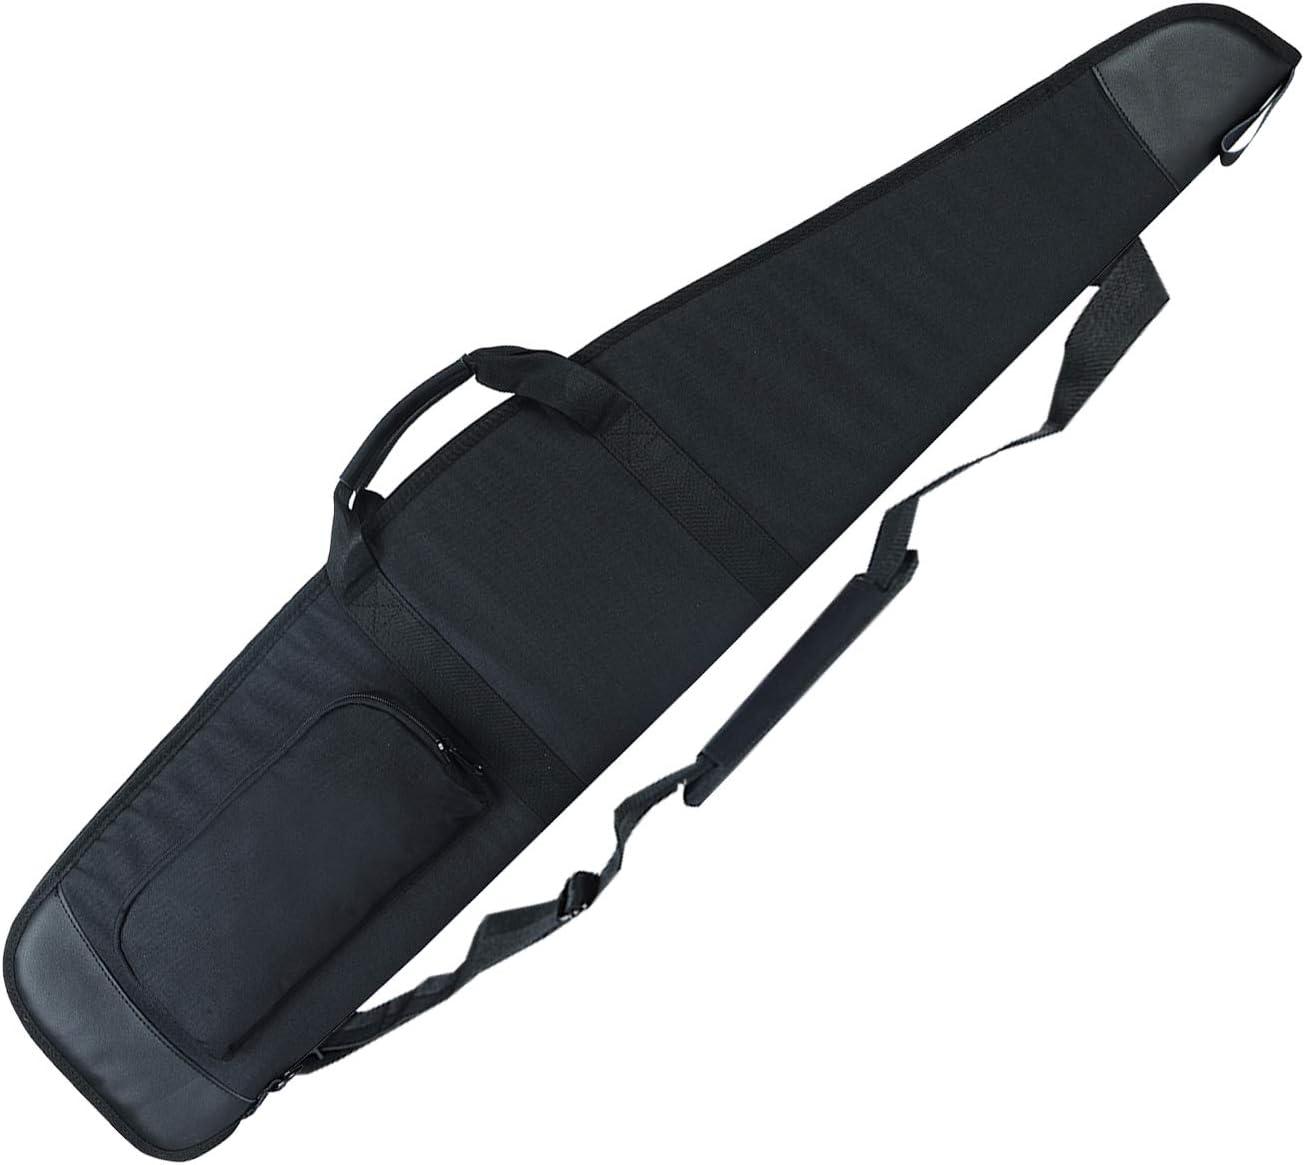 AUMTISC Soft-Rifle-Case Genuine-Leather Very popular! Gun Case for 48 in Superlatite 52 44